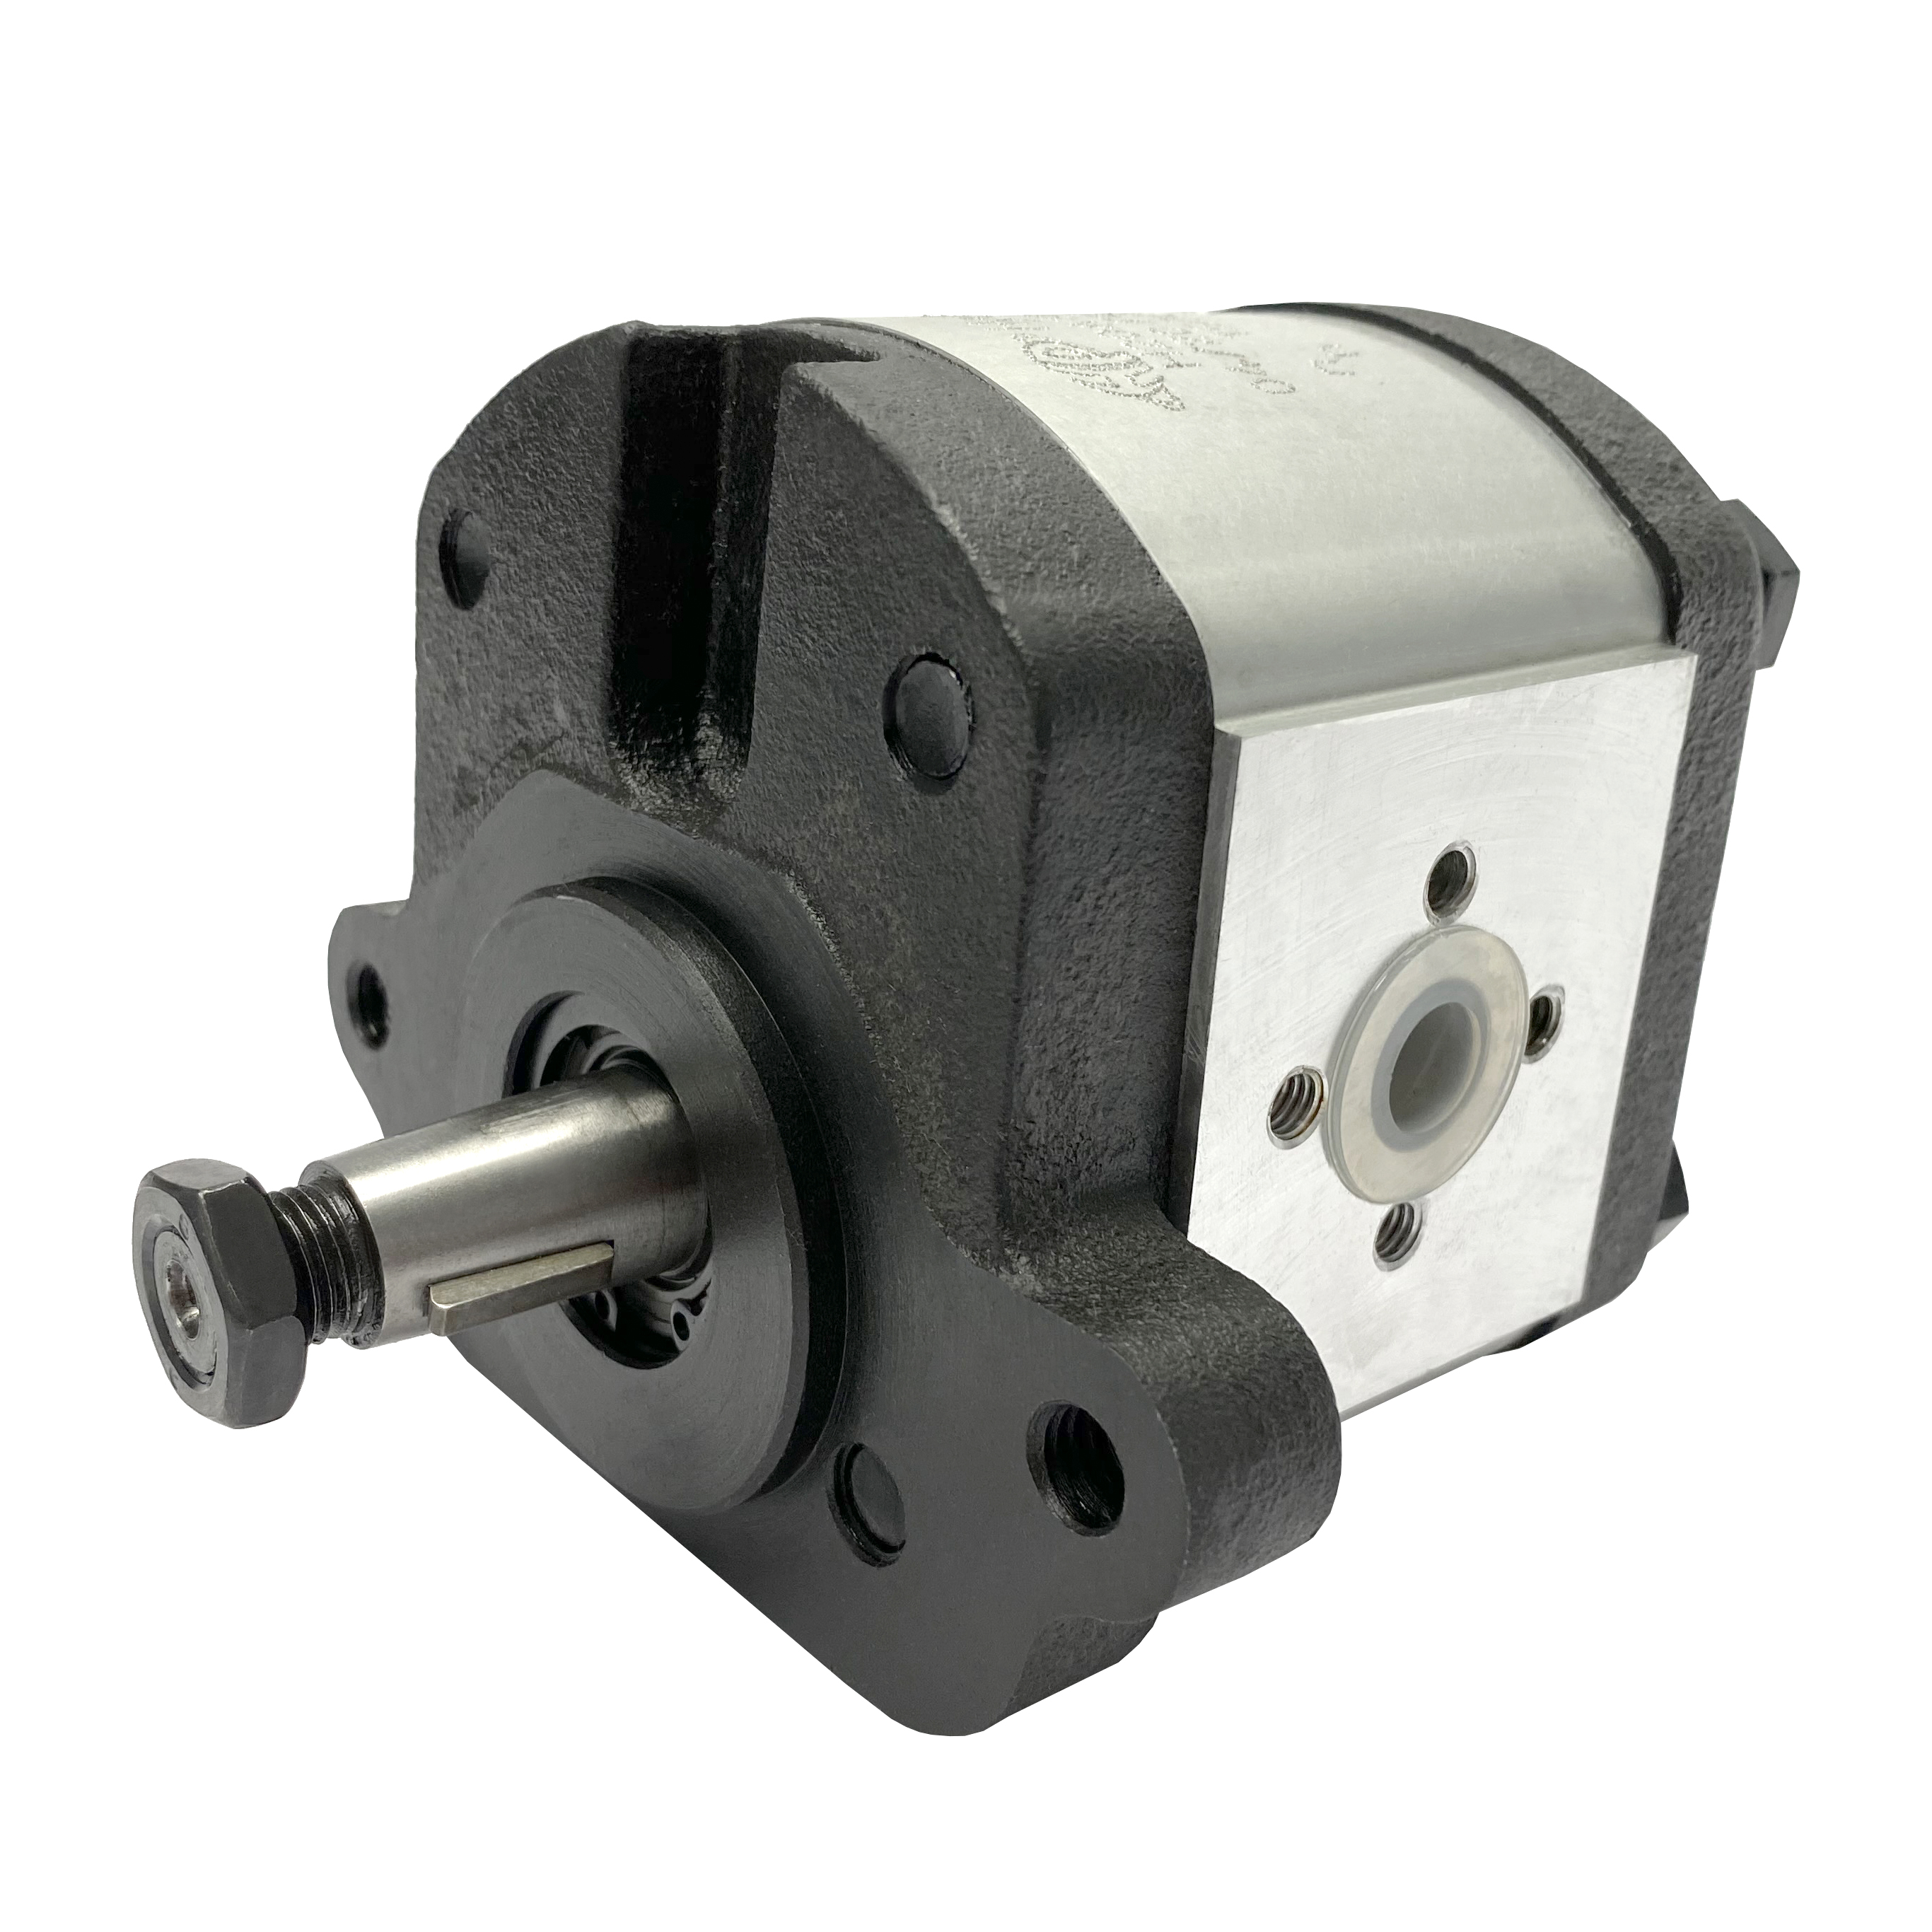 Hydraulic gear pump replacement for Massey Ferguson 3534941M91 | Magister Hydraulics